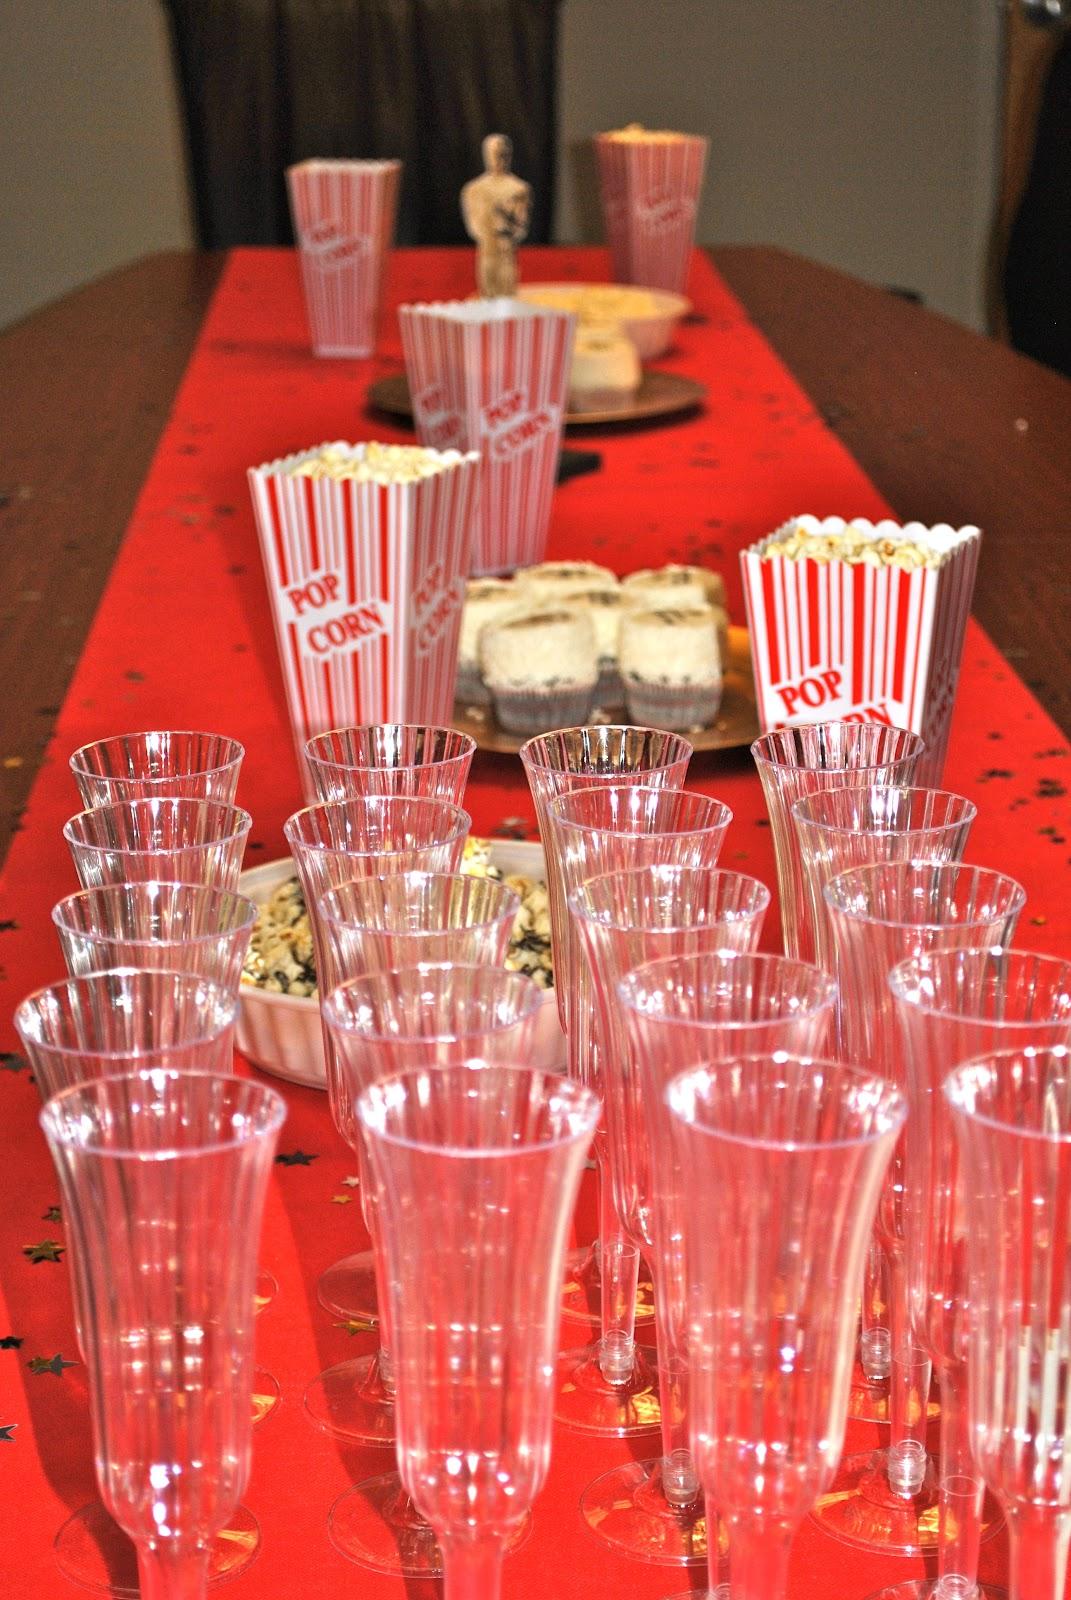 Awards Season Entertaining besides Brown Butter Marshmallow Popcorn Bars moreover Popcorn Cupcake Wrappers further Diy Oscar Party also Oscar Night Festive Popcorn Cupcakes. on oscar night festive popcorn cupcakes